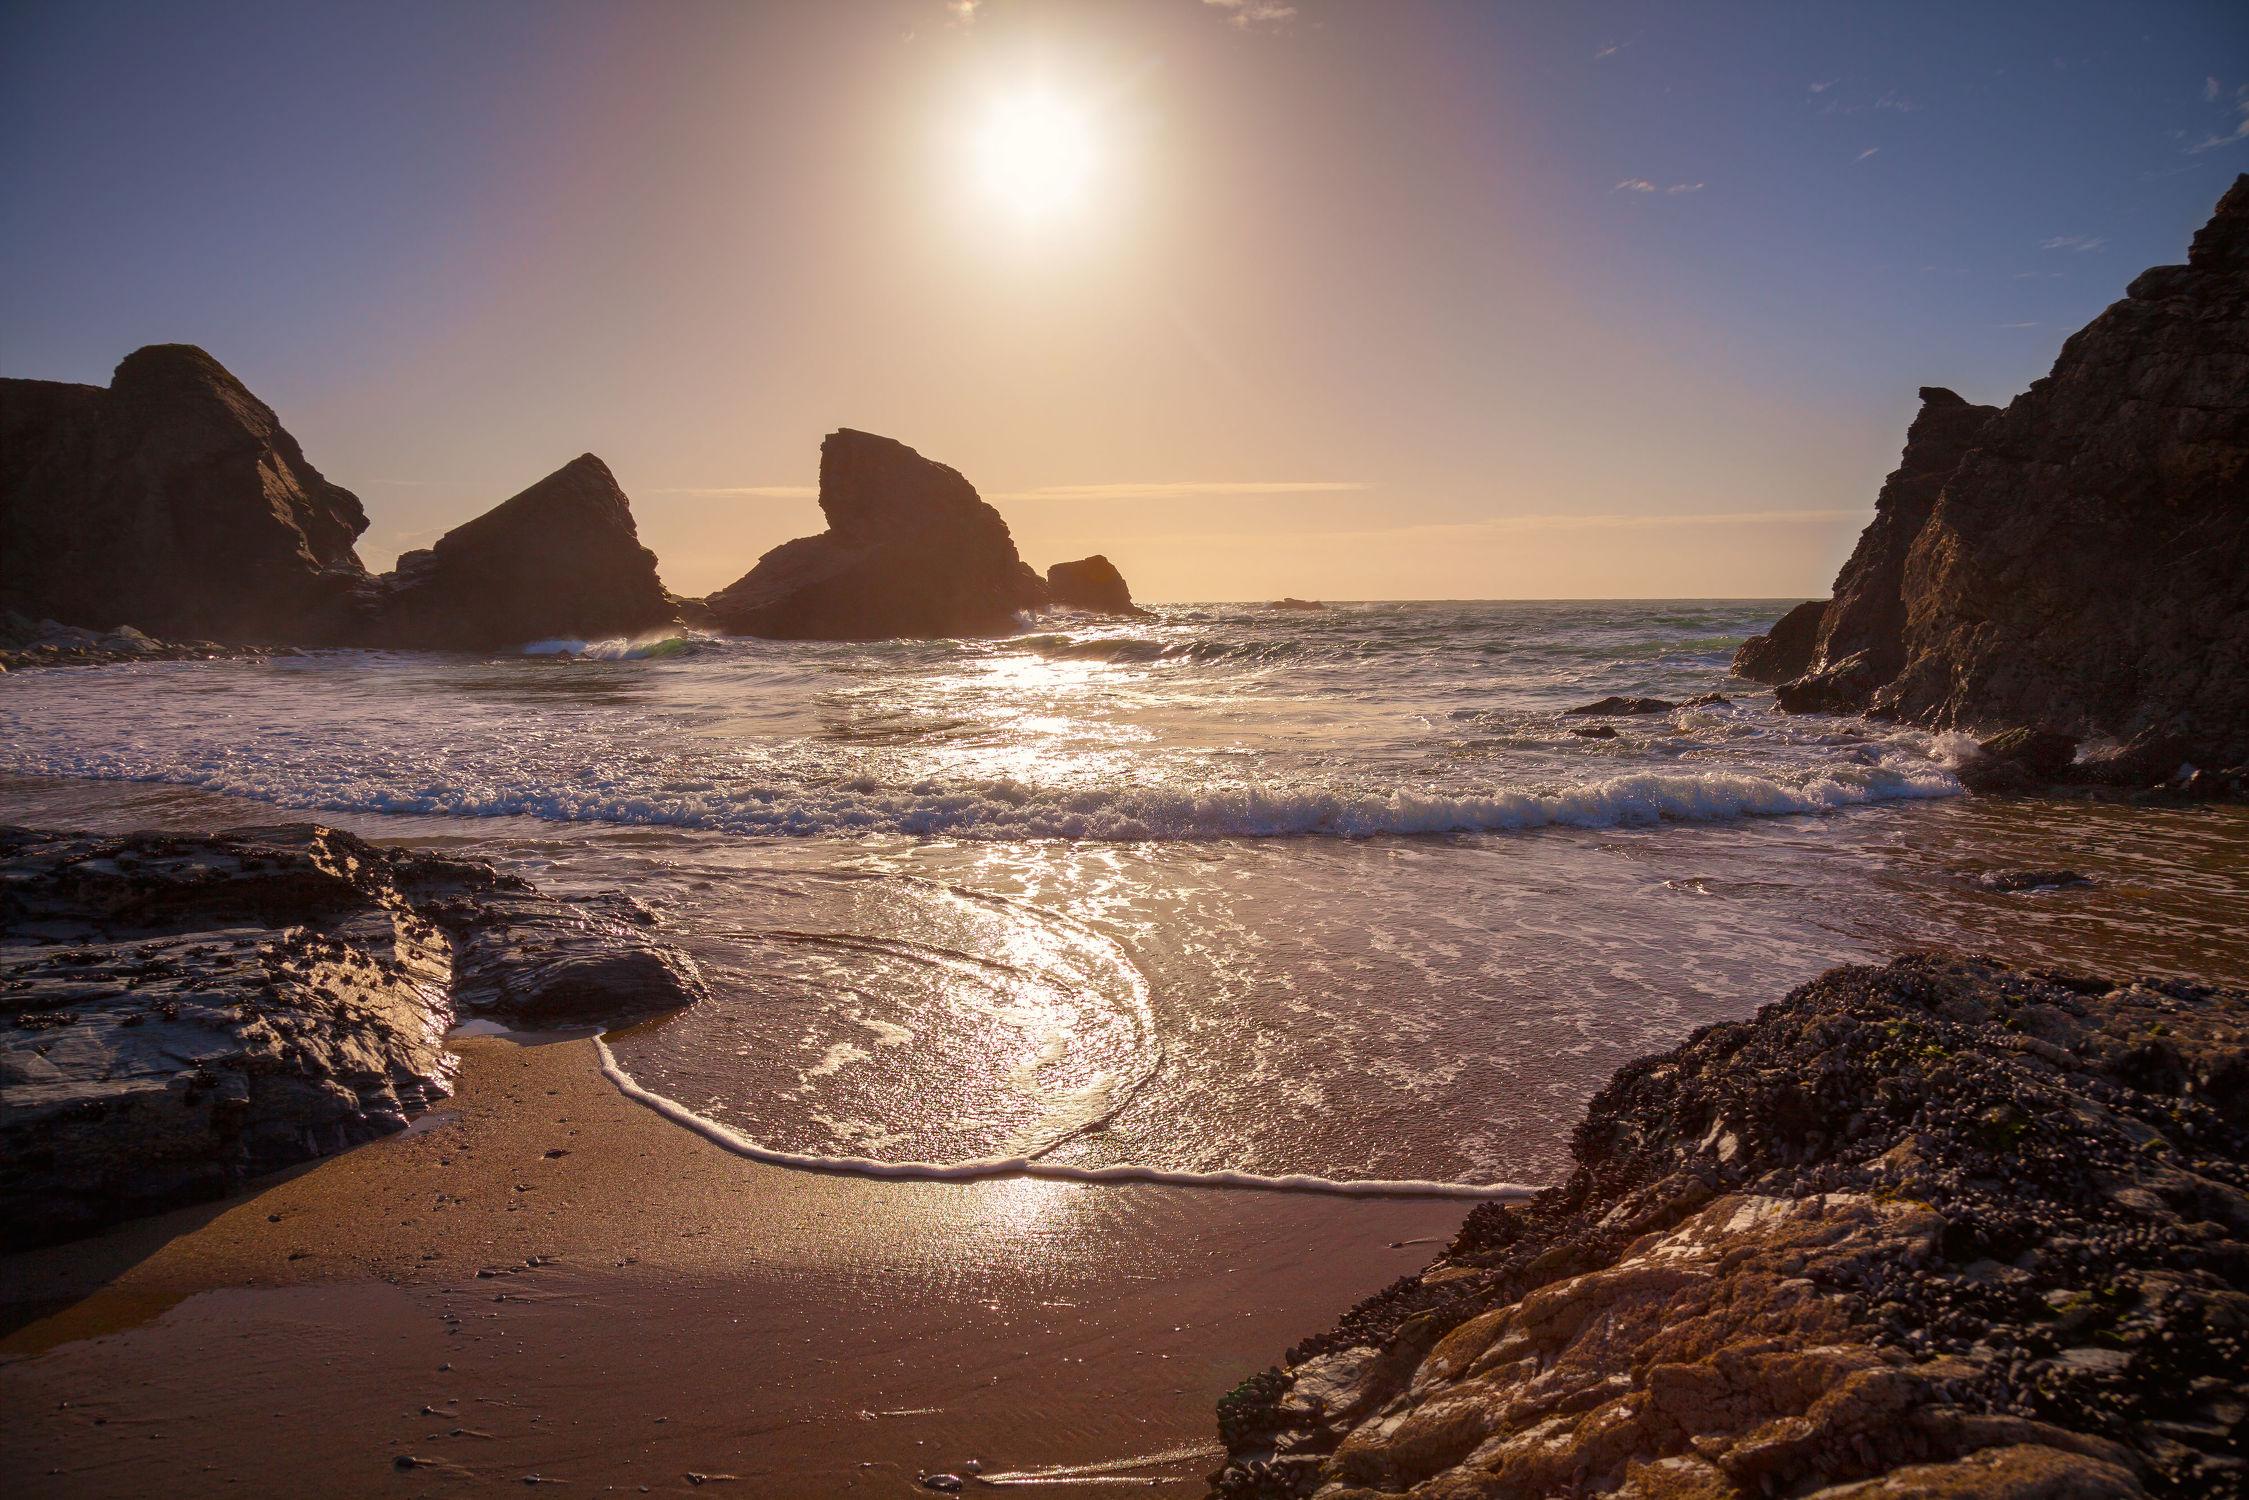 Bild mit Natur, Wasser, Gewässer, Felsen, Wellen, Sonnenuntergang, Sonnenaufgang, Am Meer, ozean